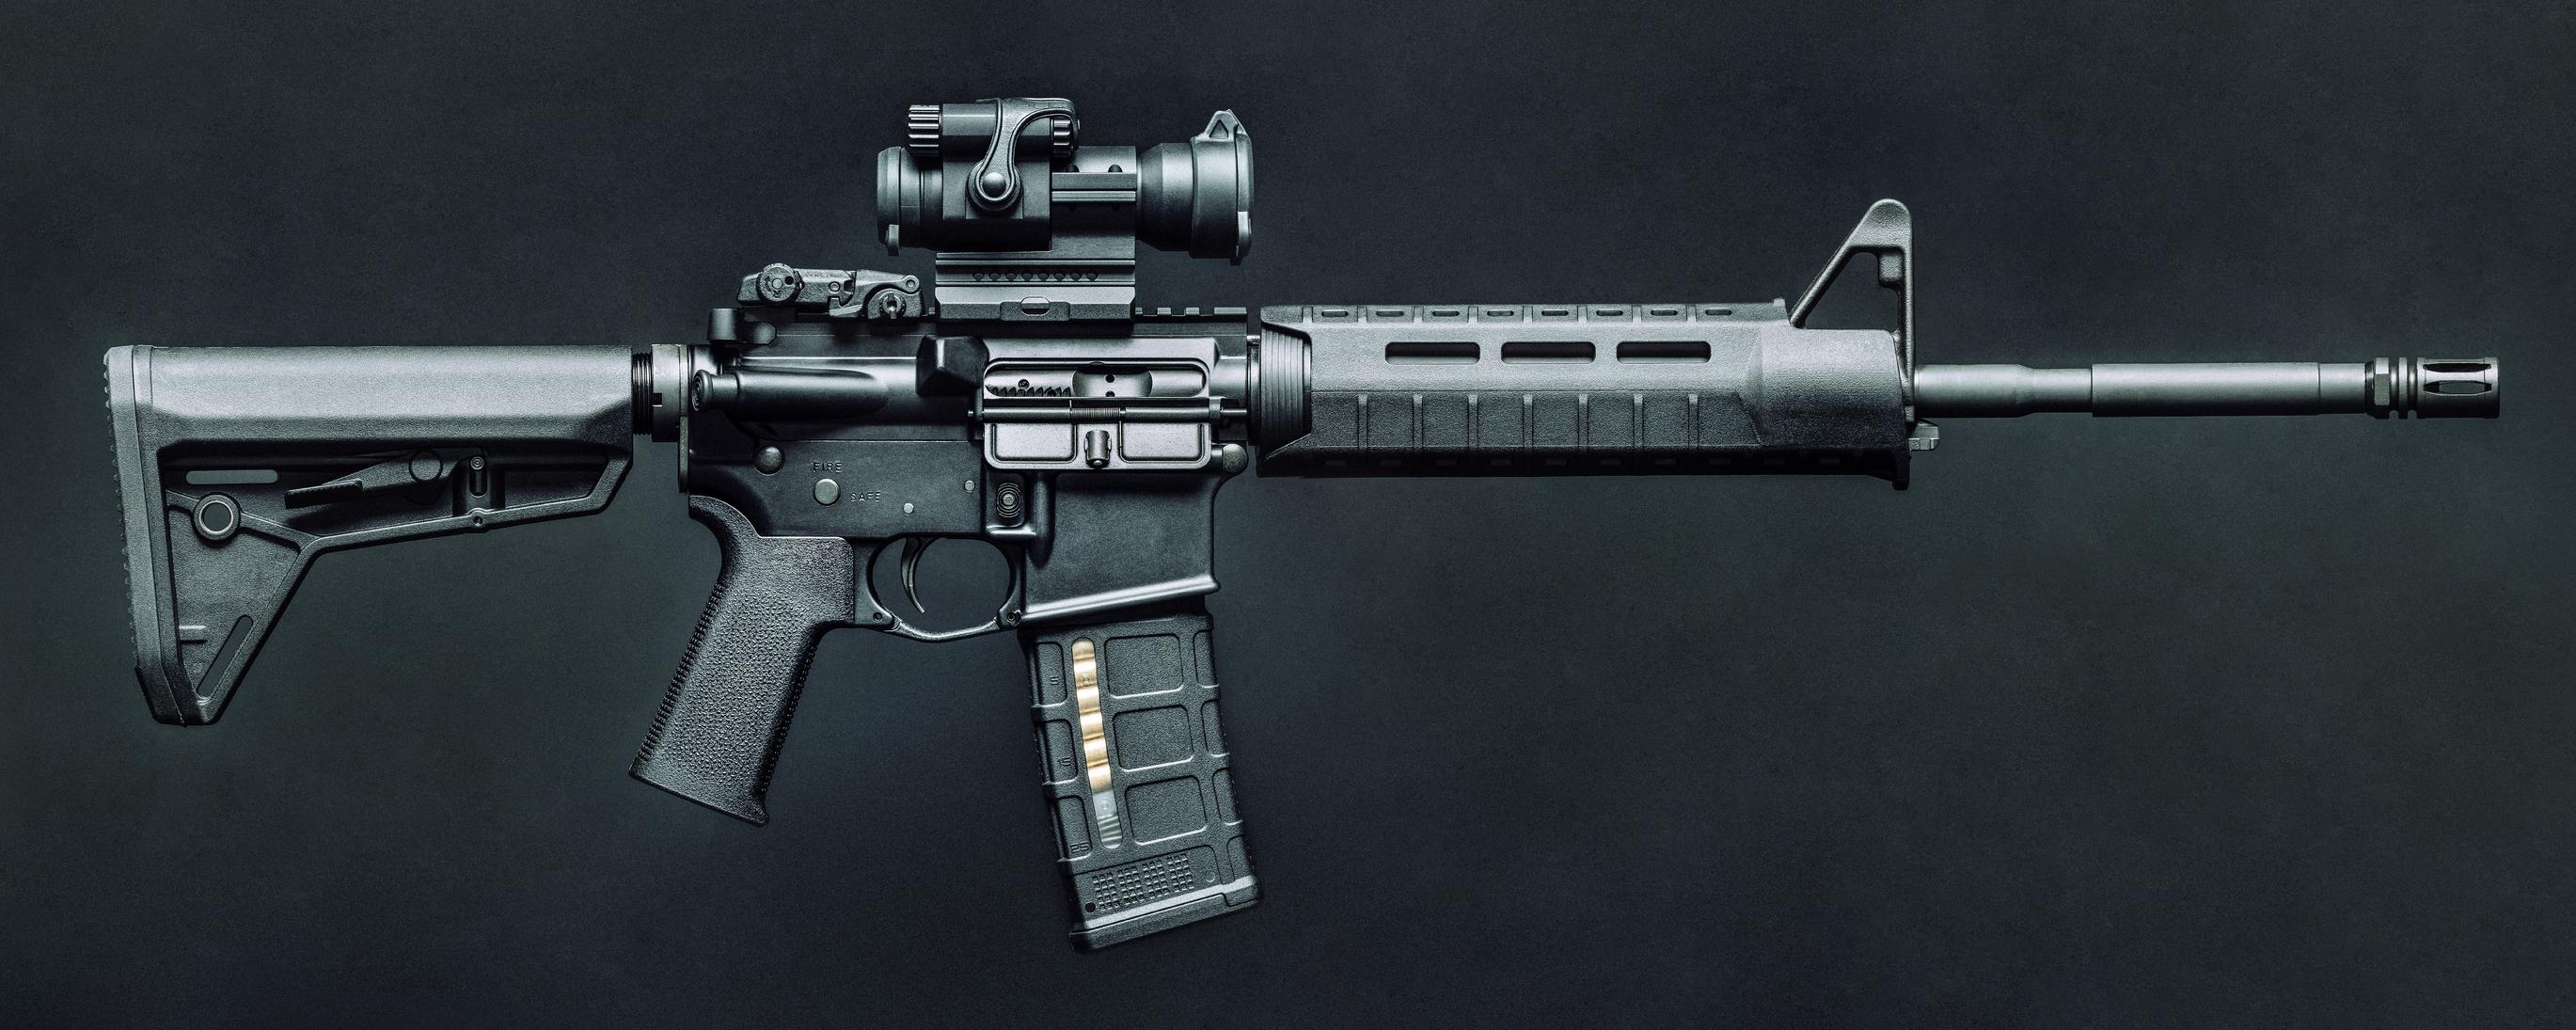 California Gun Law Threatened By 10 Part